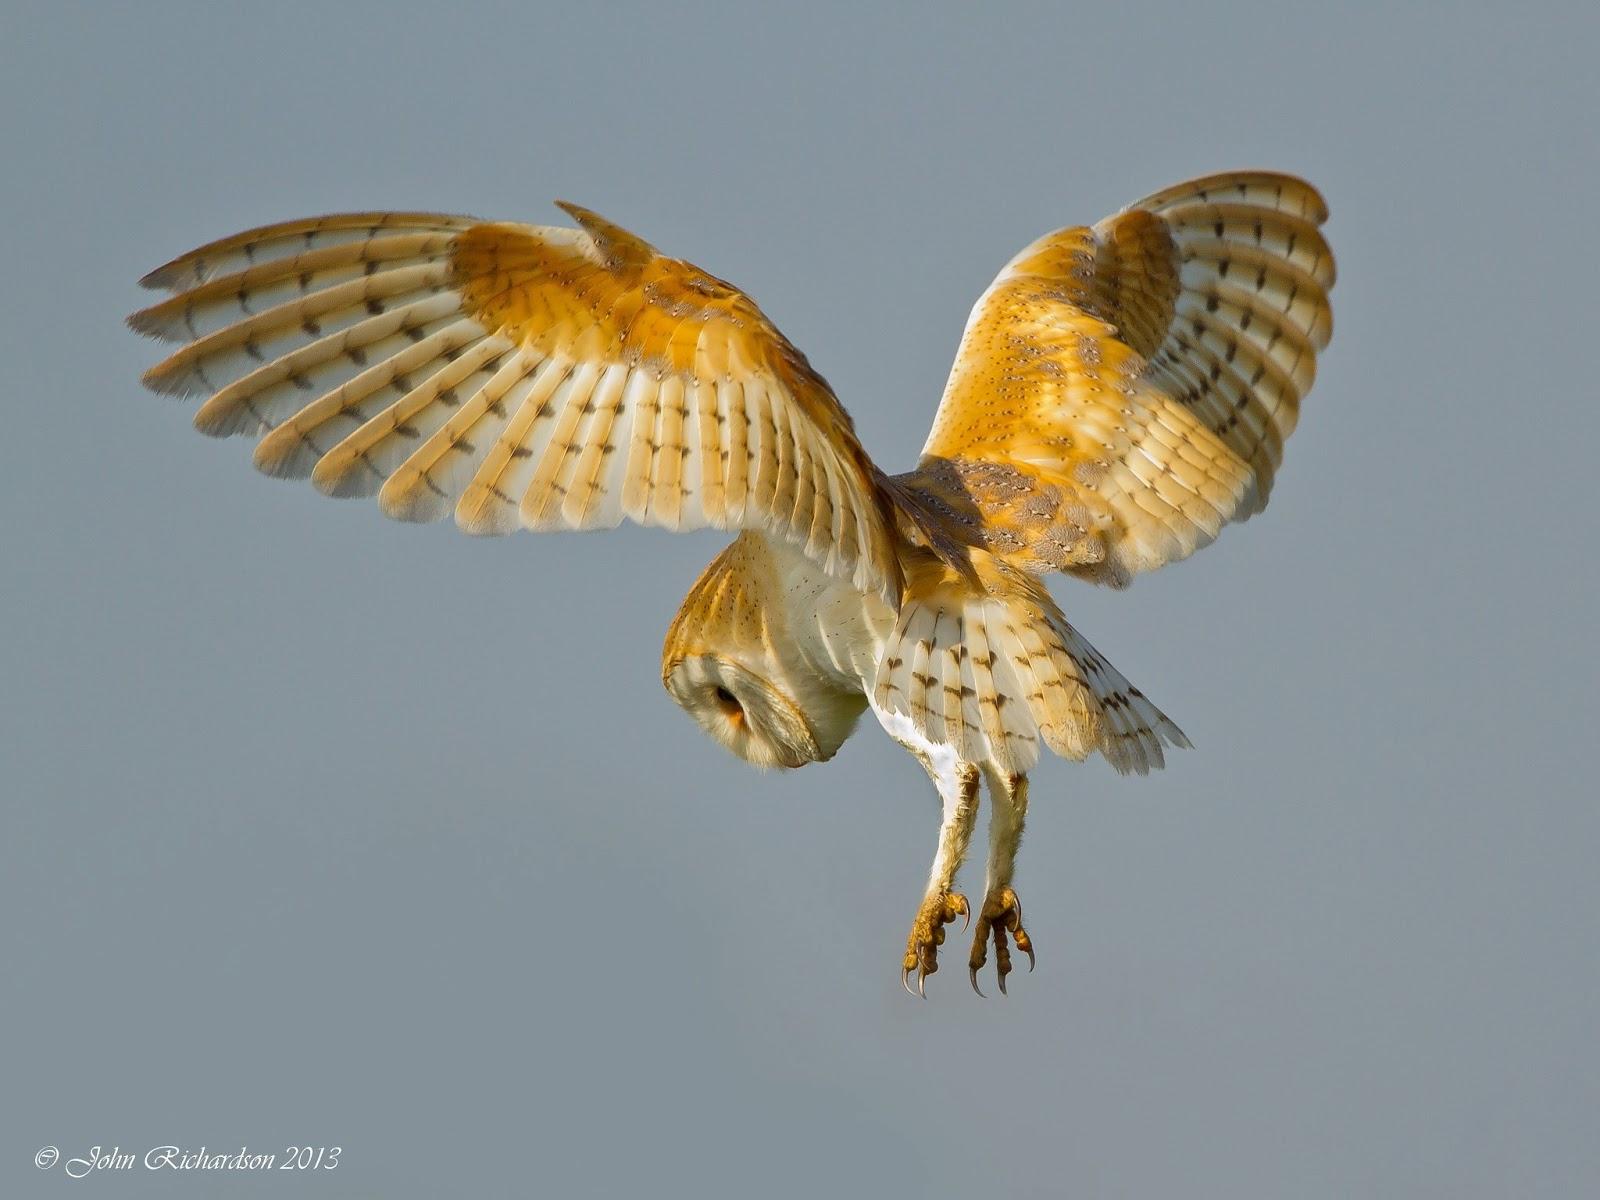 Barn owl catching prey